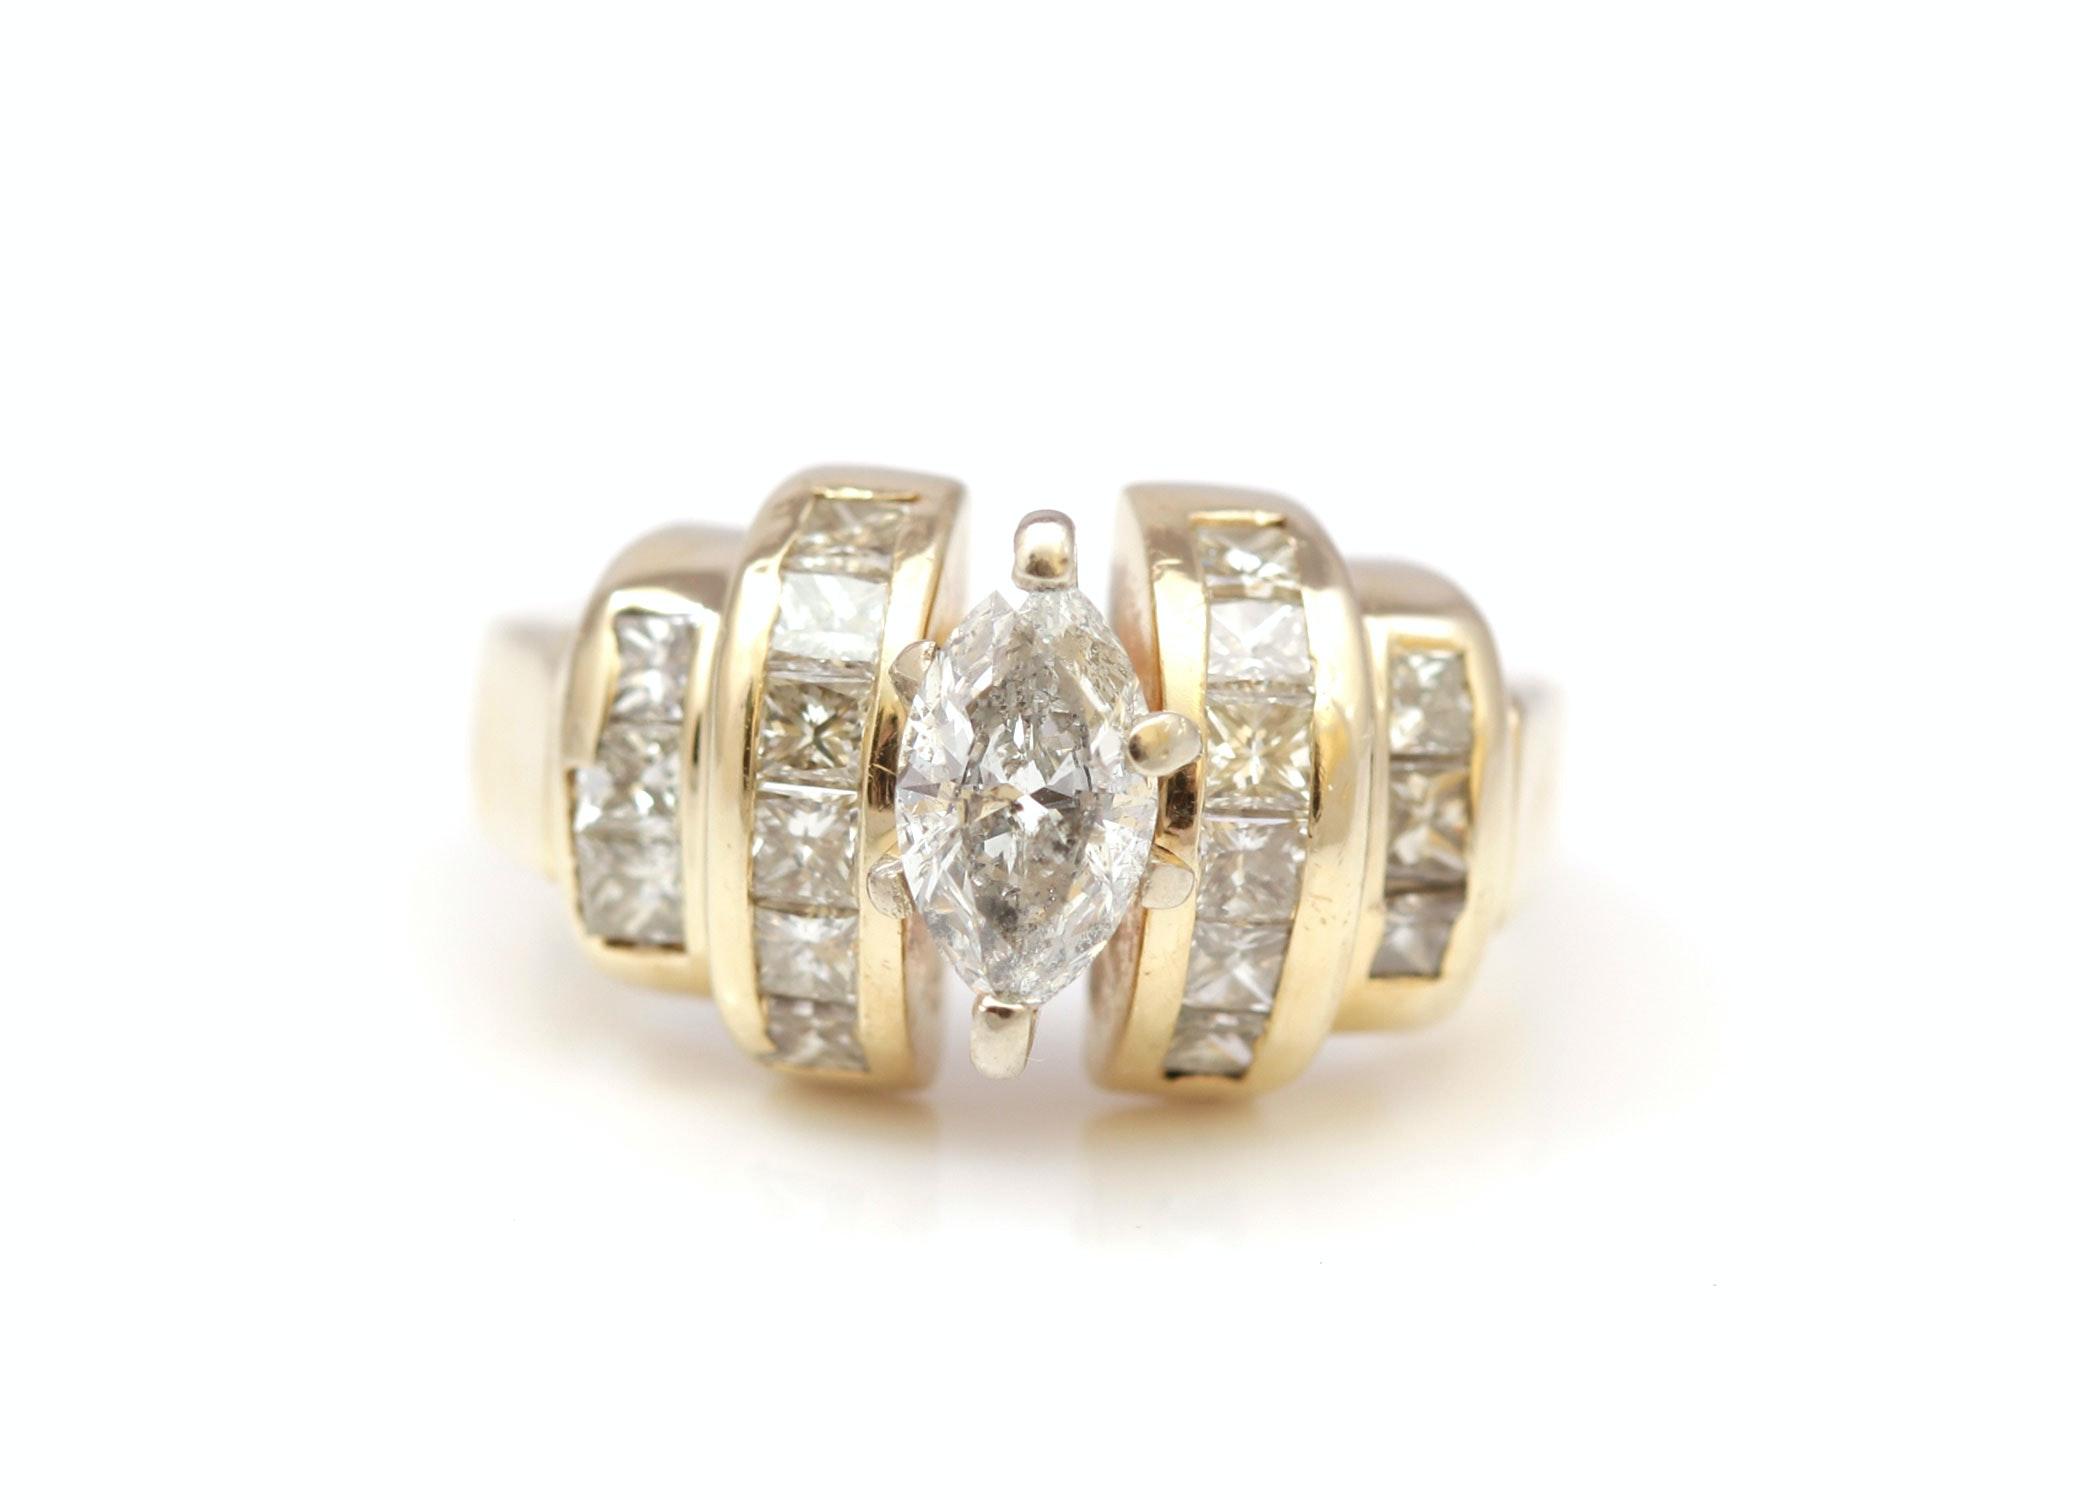 14K Yellow Gold 1.70 CTW Diamond Ring